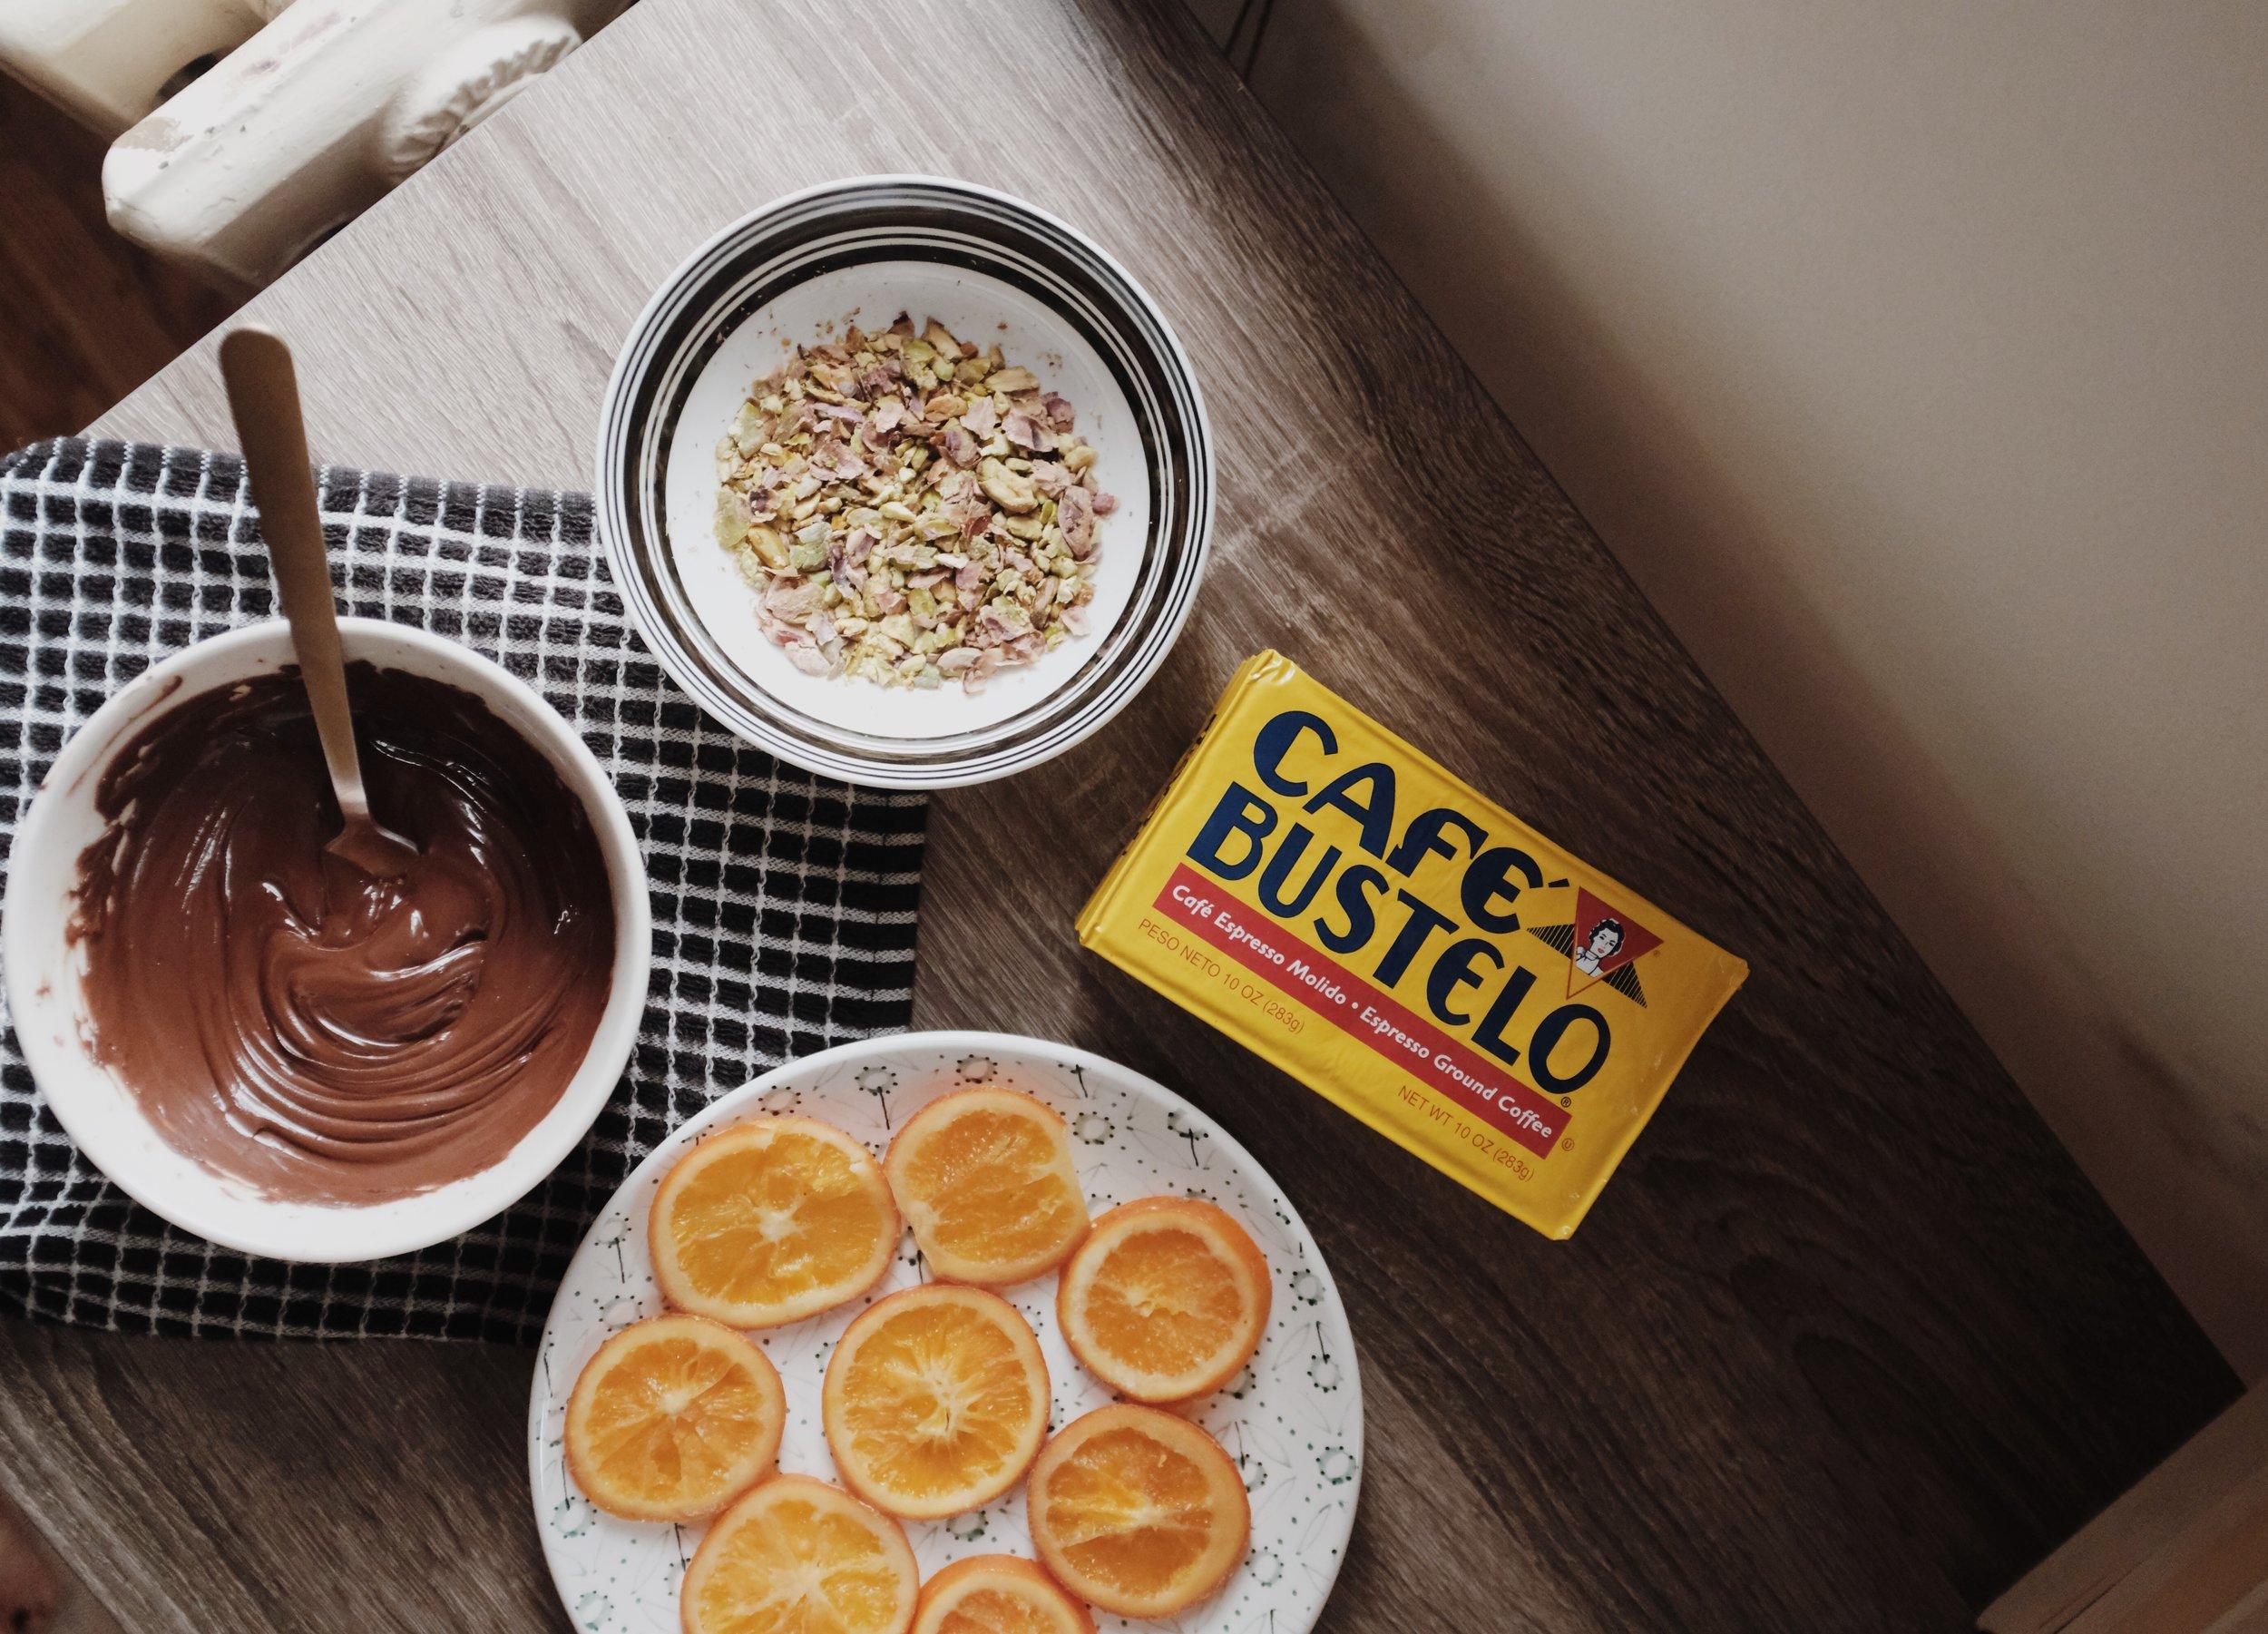 cafe-bustelo-coffee-oranges-dessert.jpg